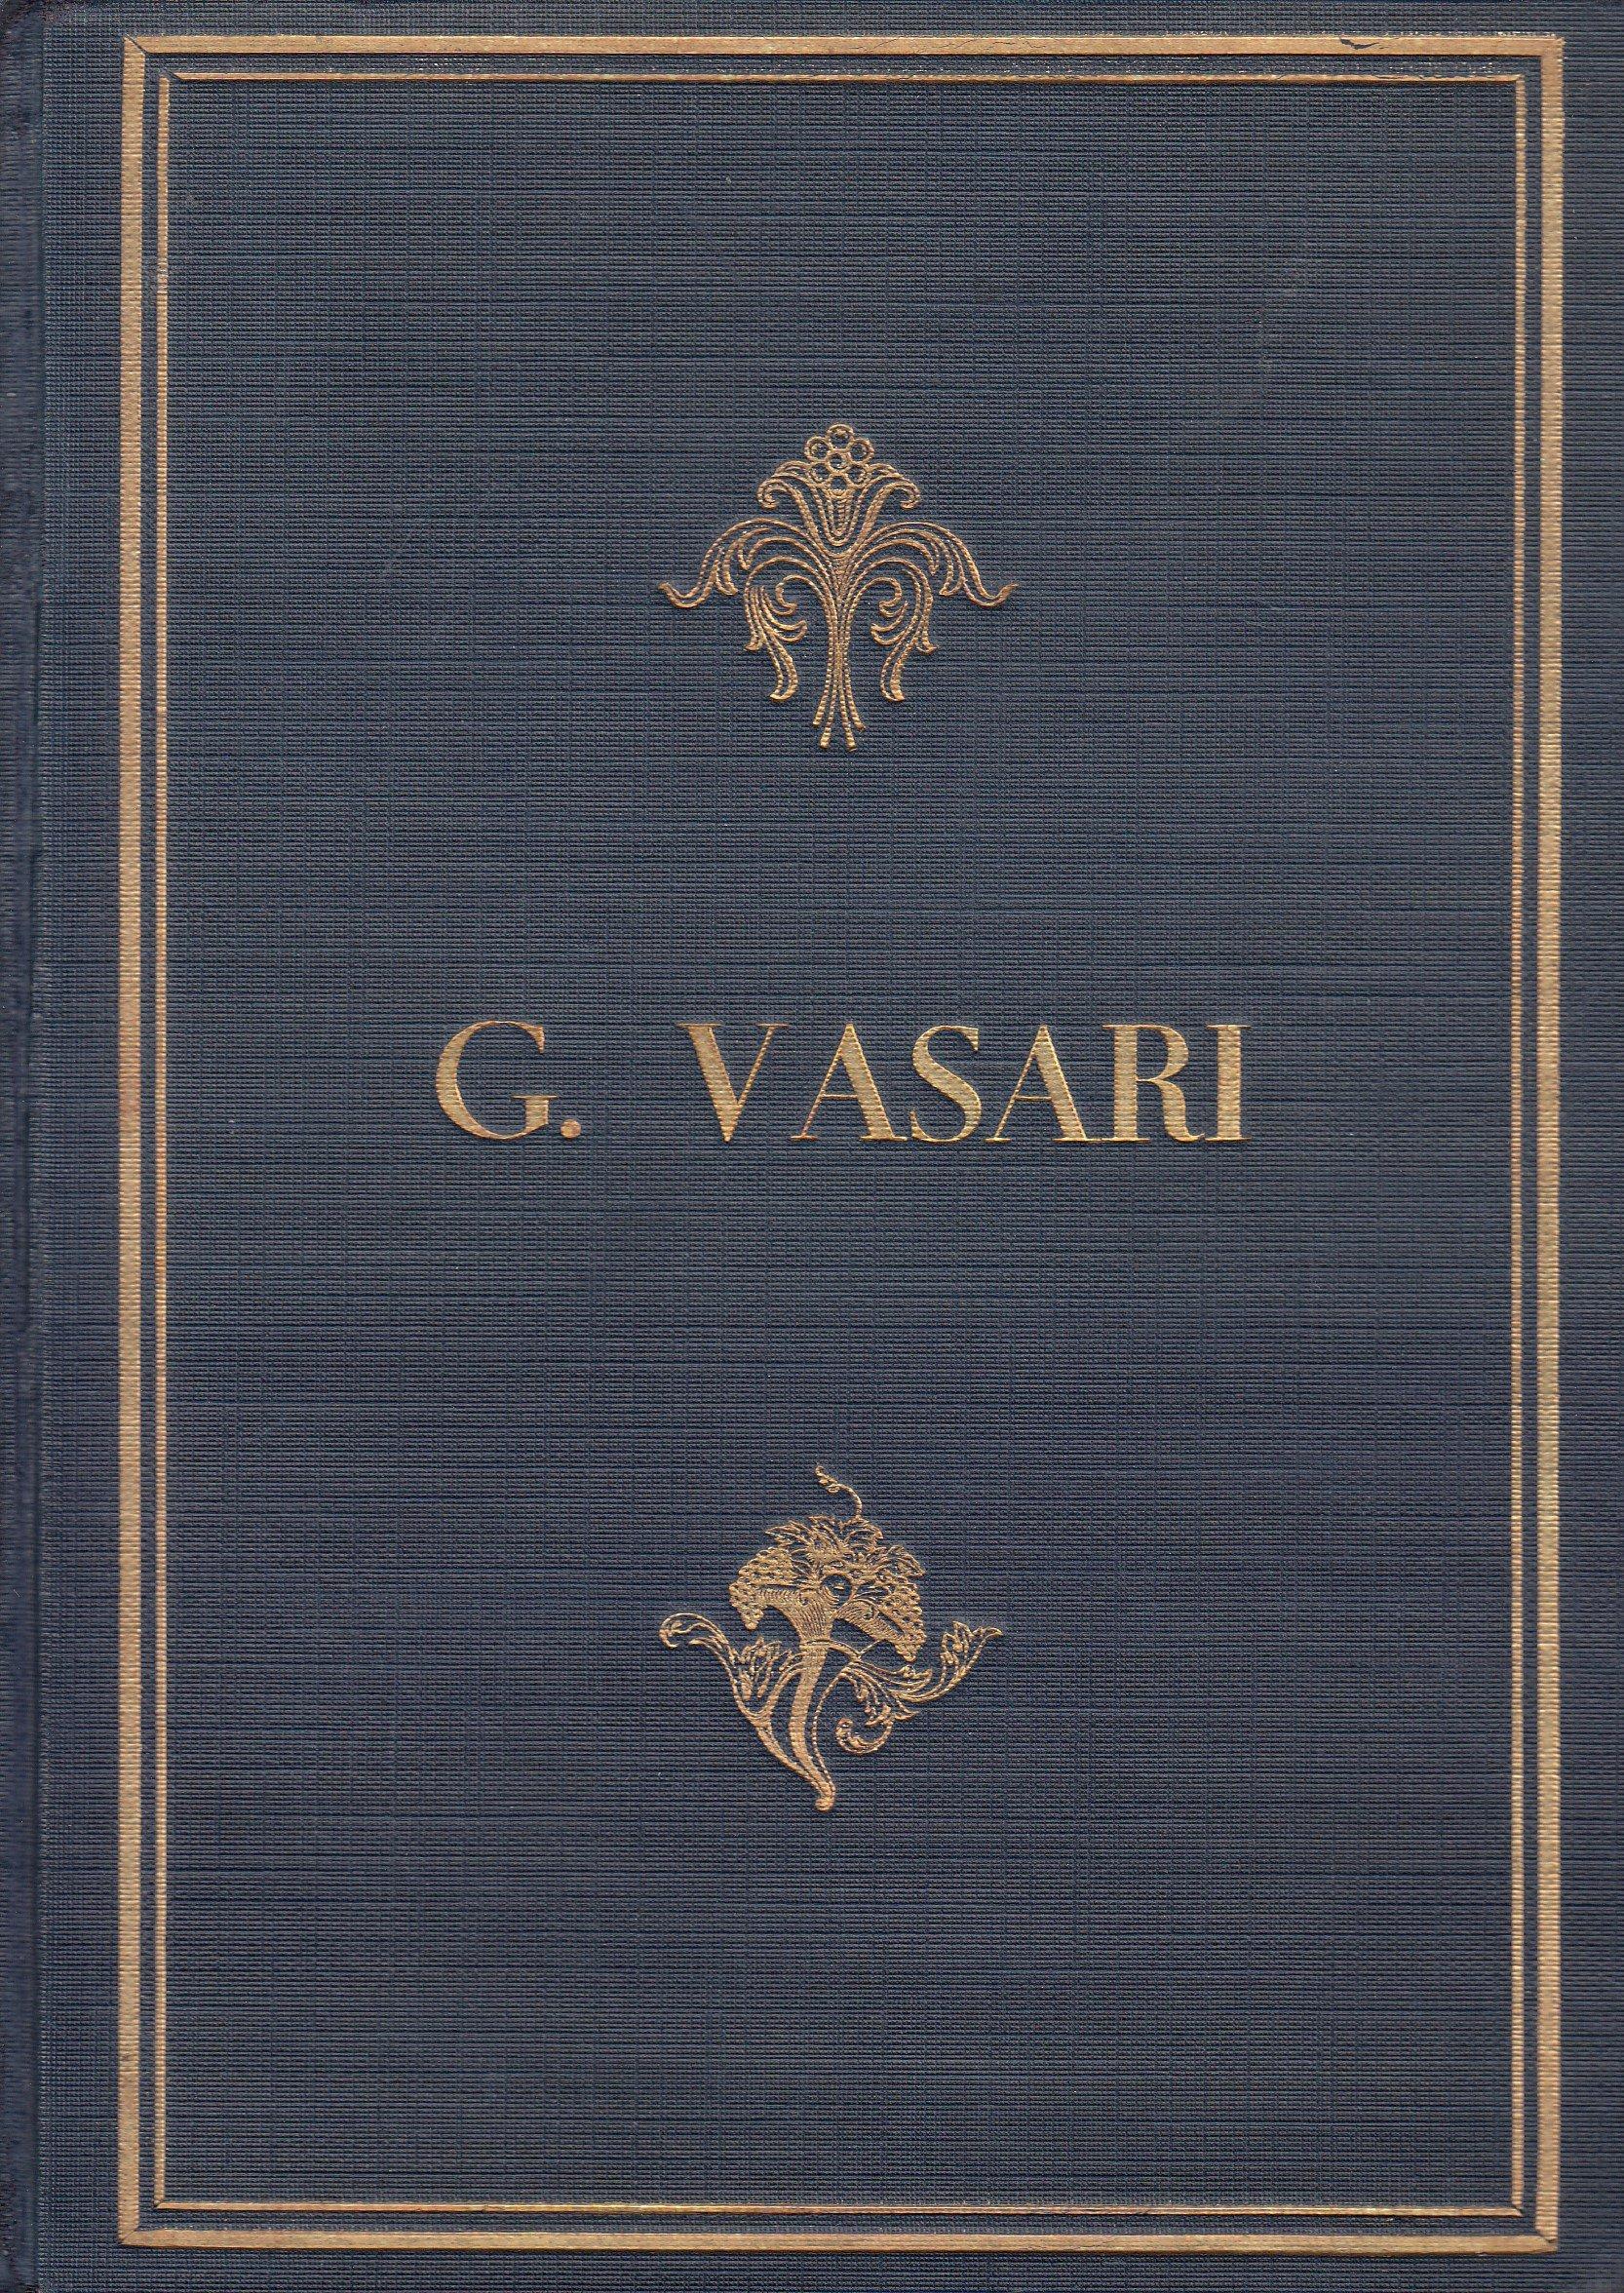 Giorgio Vasari Zivotopisy Umelcu Spalena 53